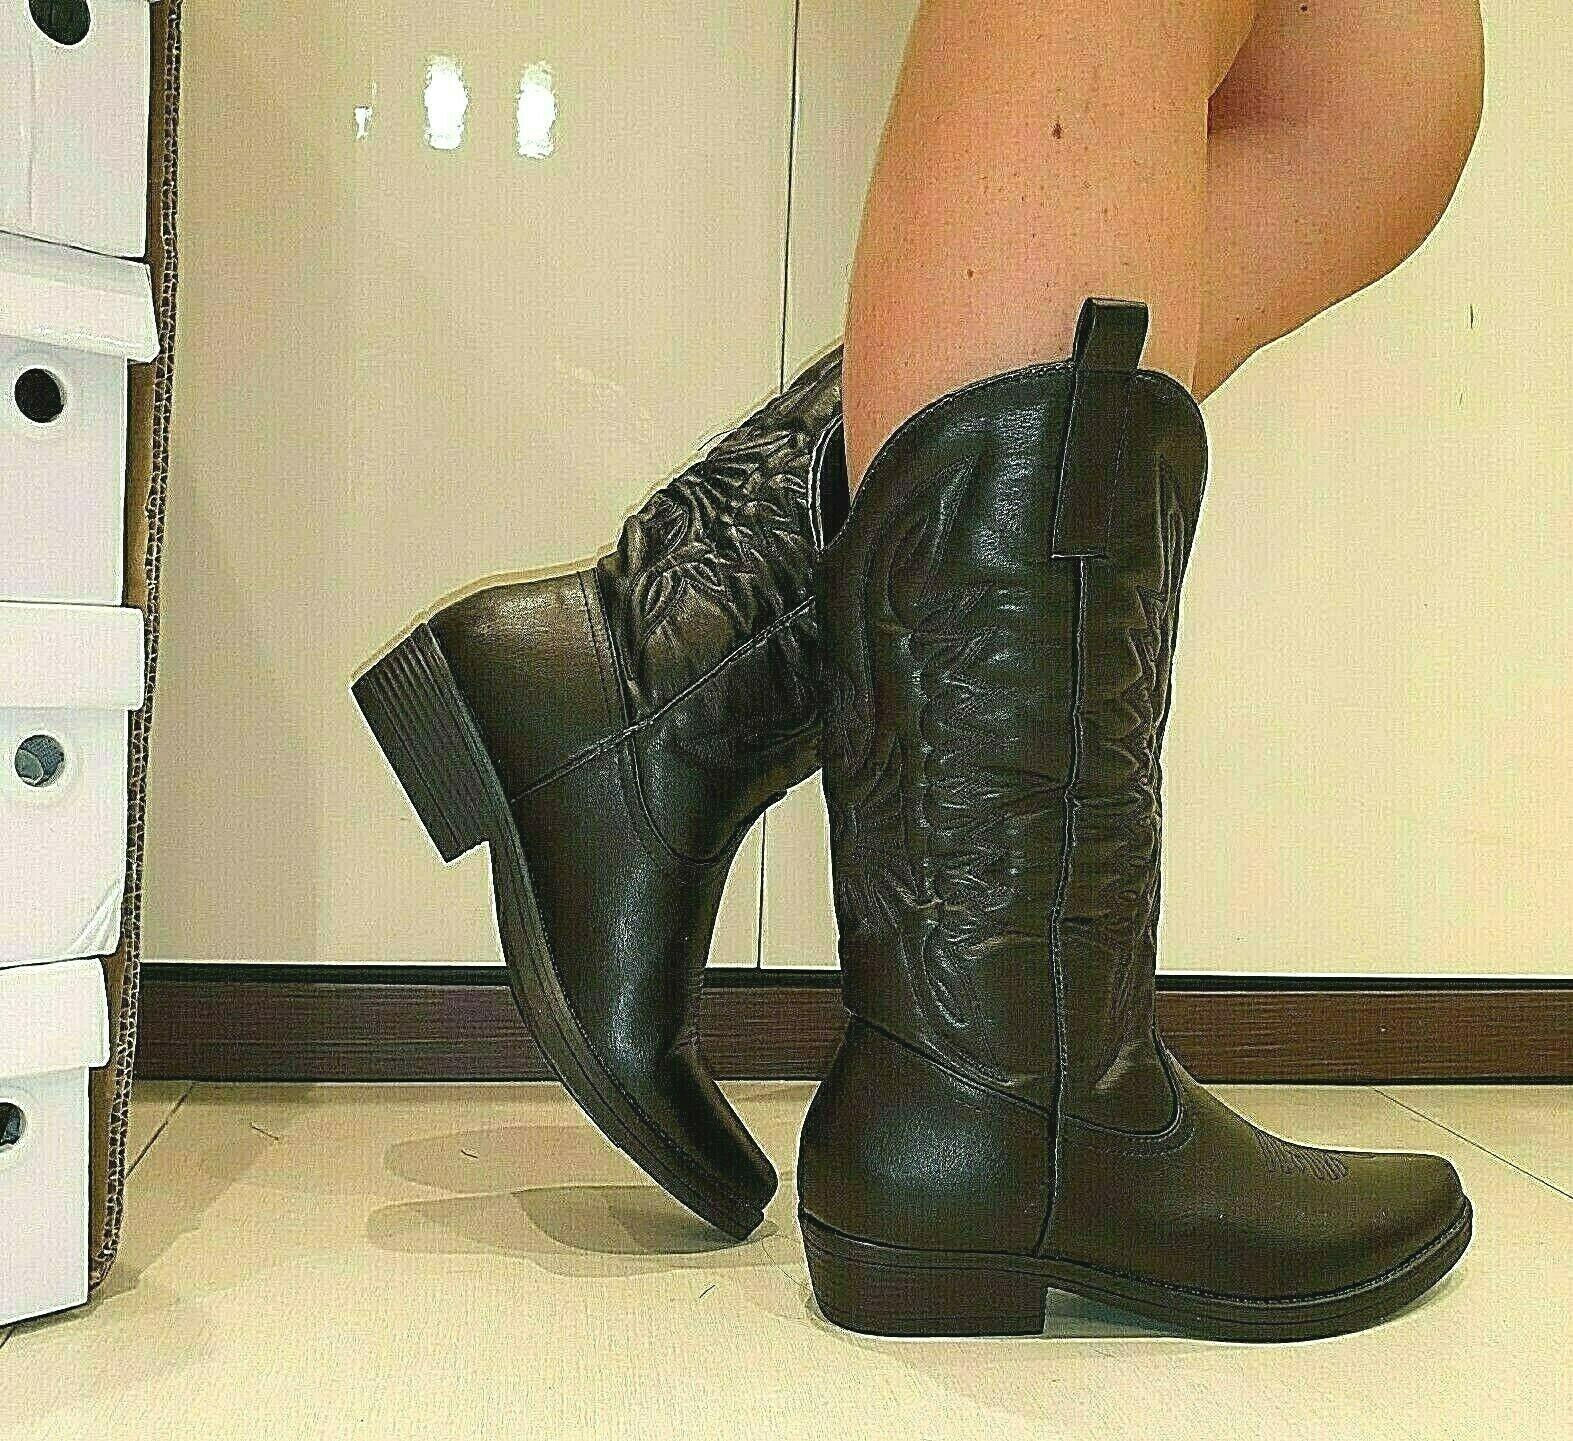 ORIGINALI STEVE MADDEN ISAAC Stivali alti scarpe donna